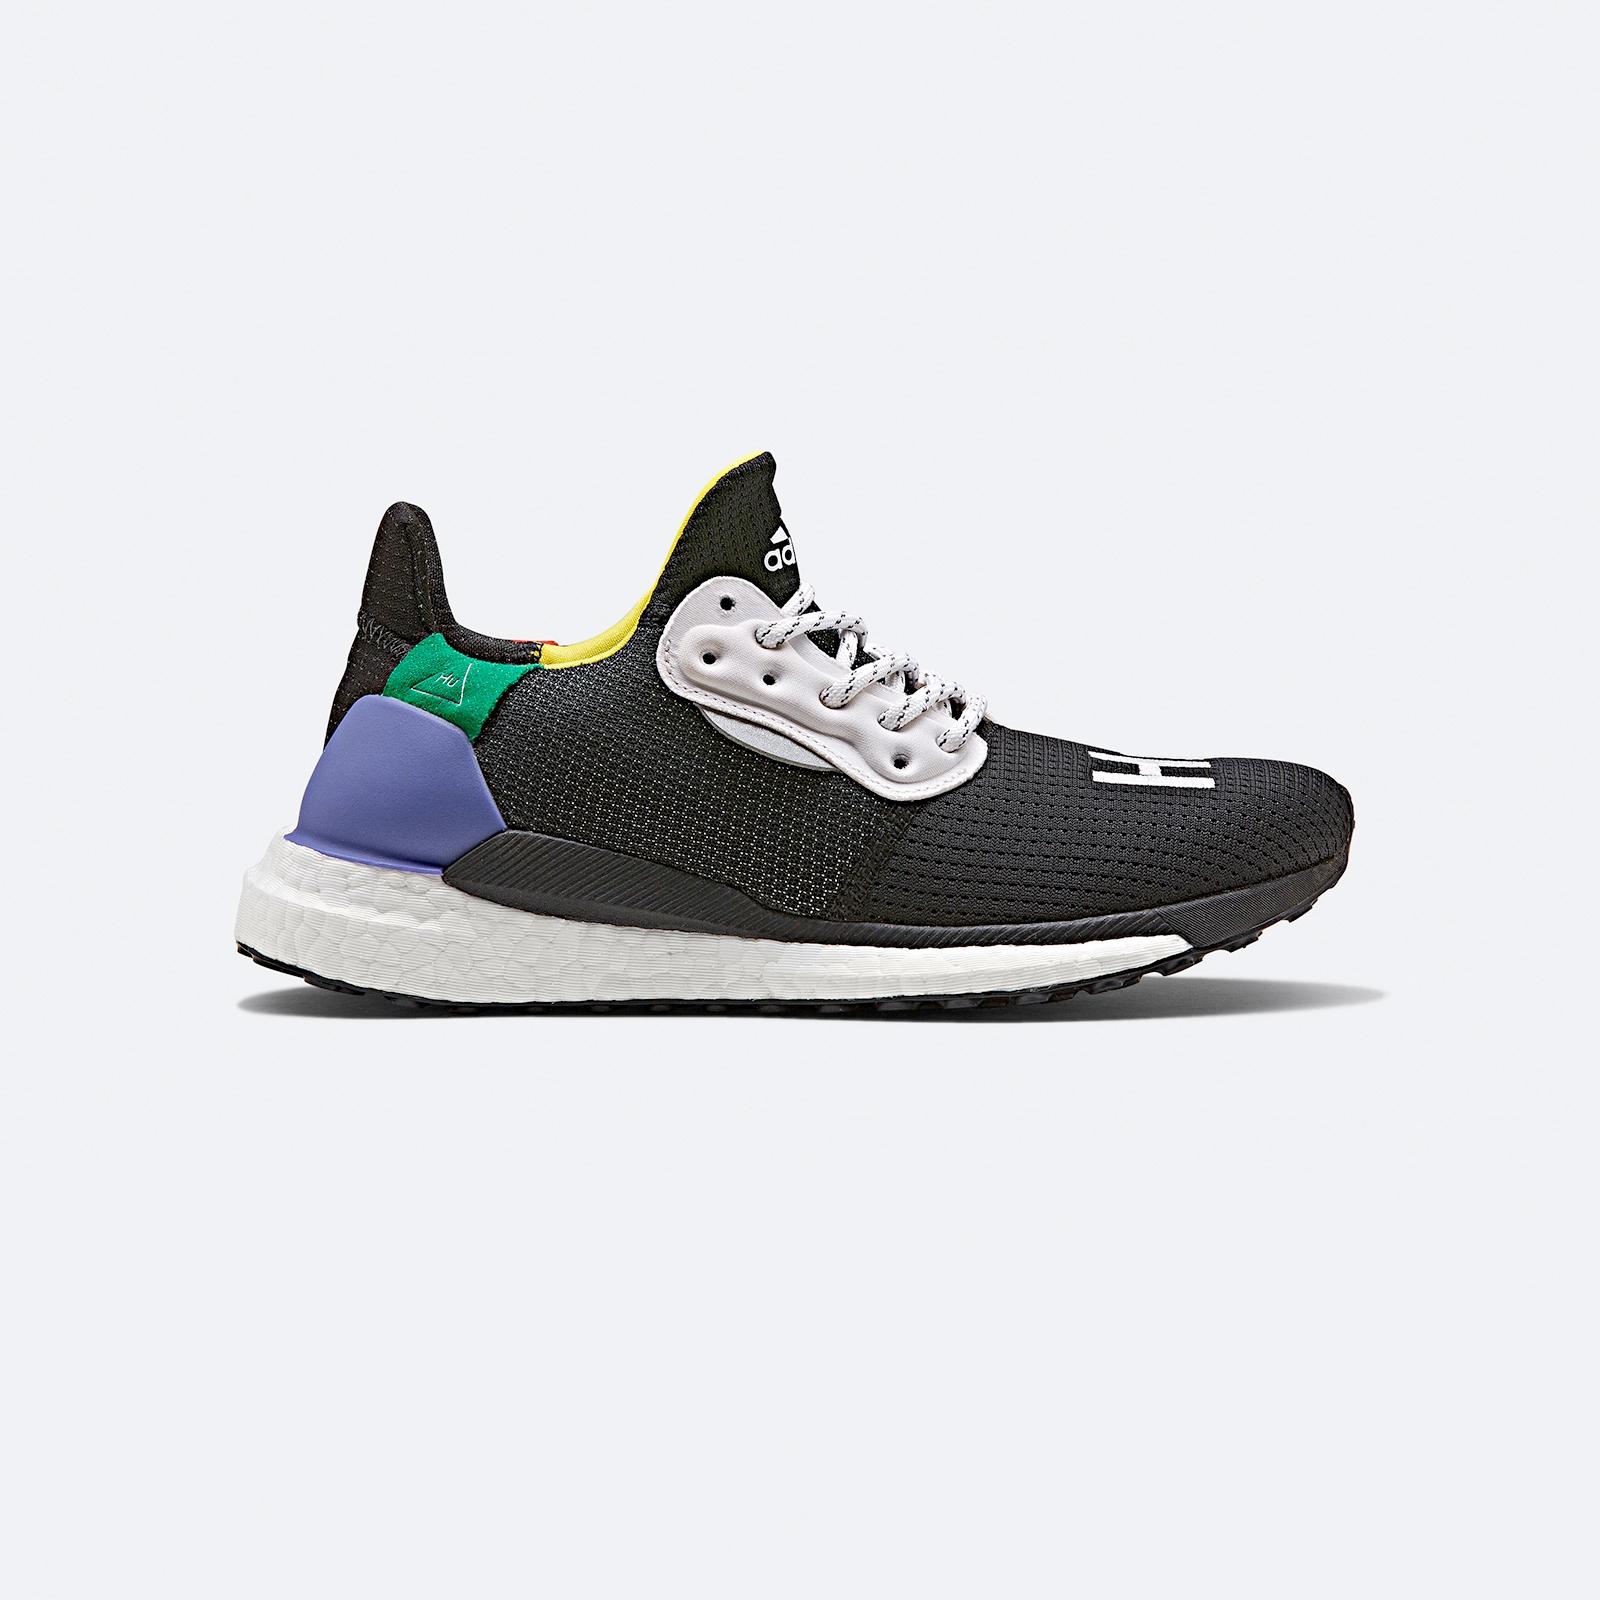 a8ec67bcd2e94 adidas PW x HU Solar Glide - Bb8041 - Sneakersnstuff